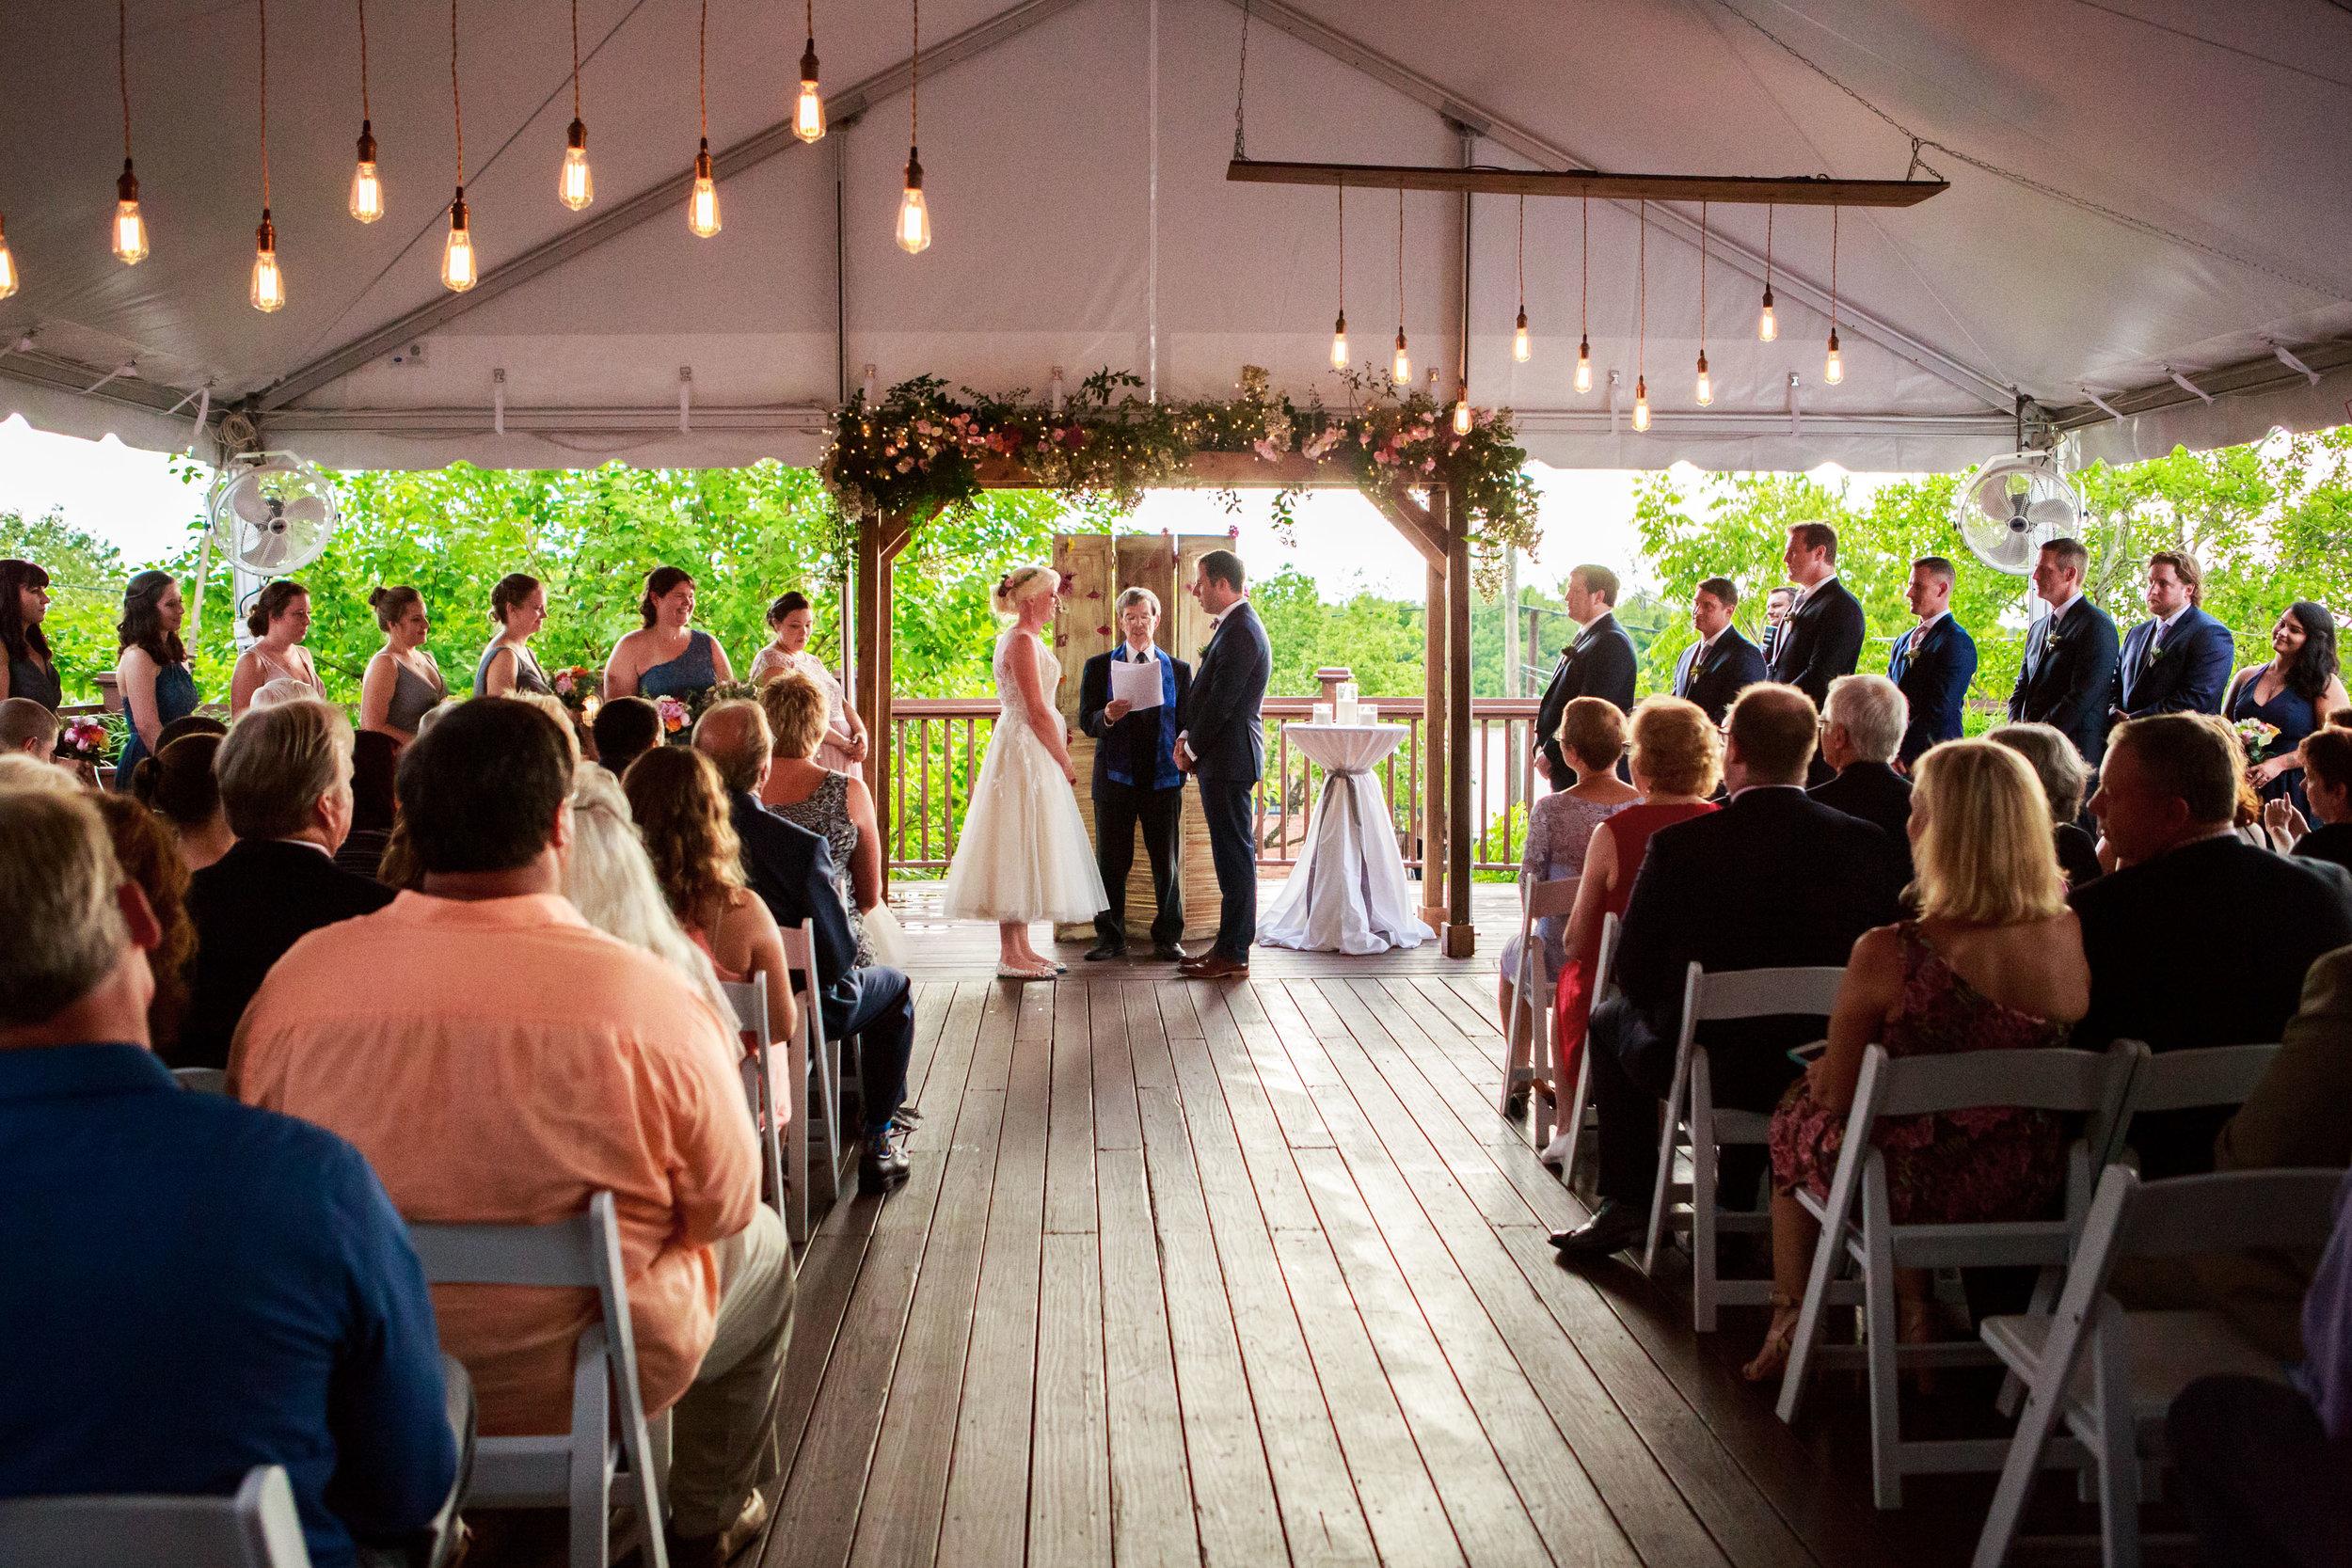 128-South-Wedding-Wilmington-NC-Photographer-Ceremony-19.31.jpg